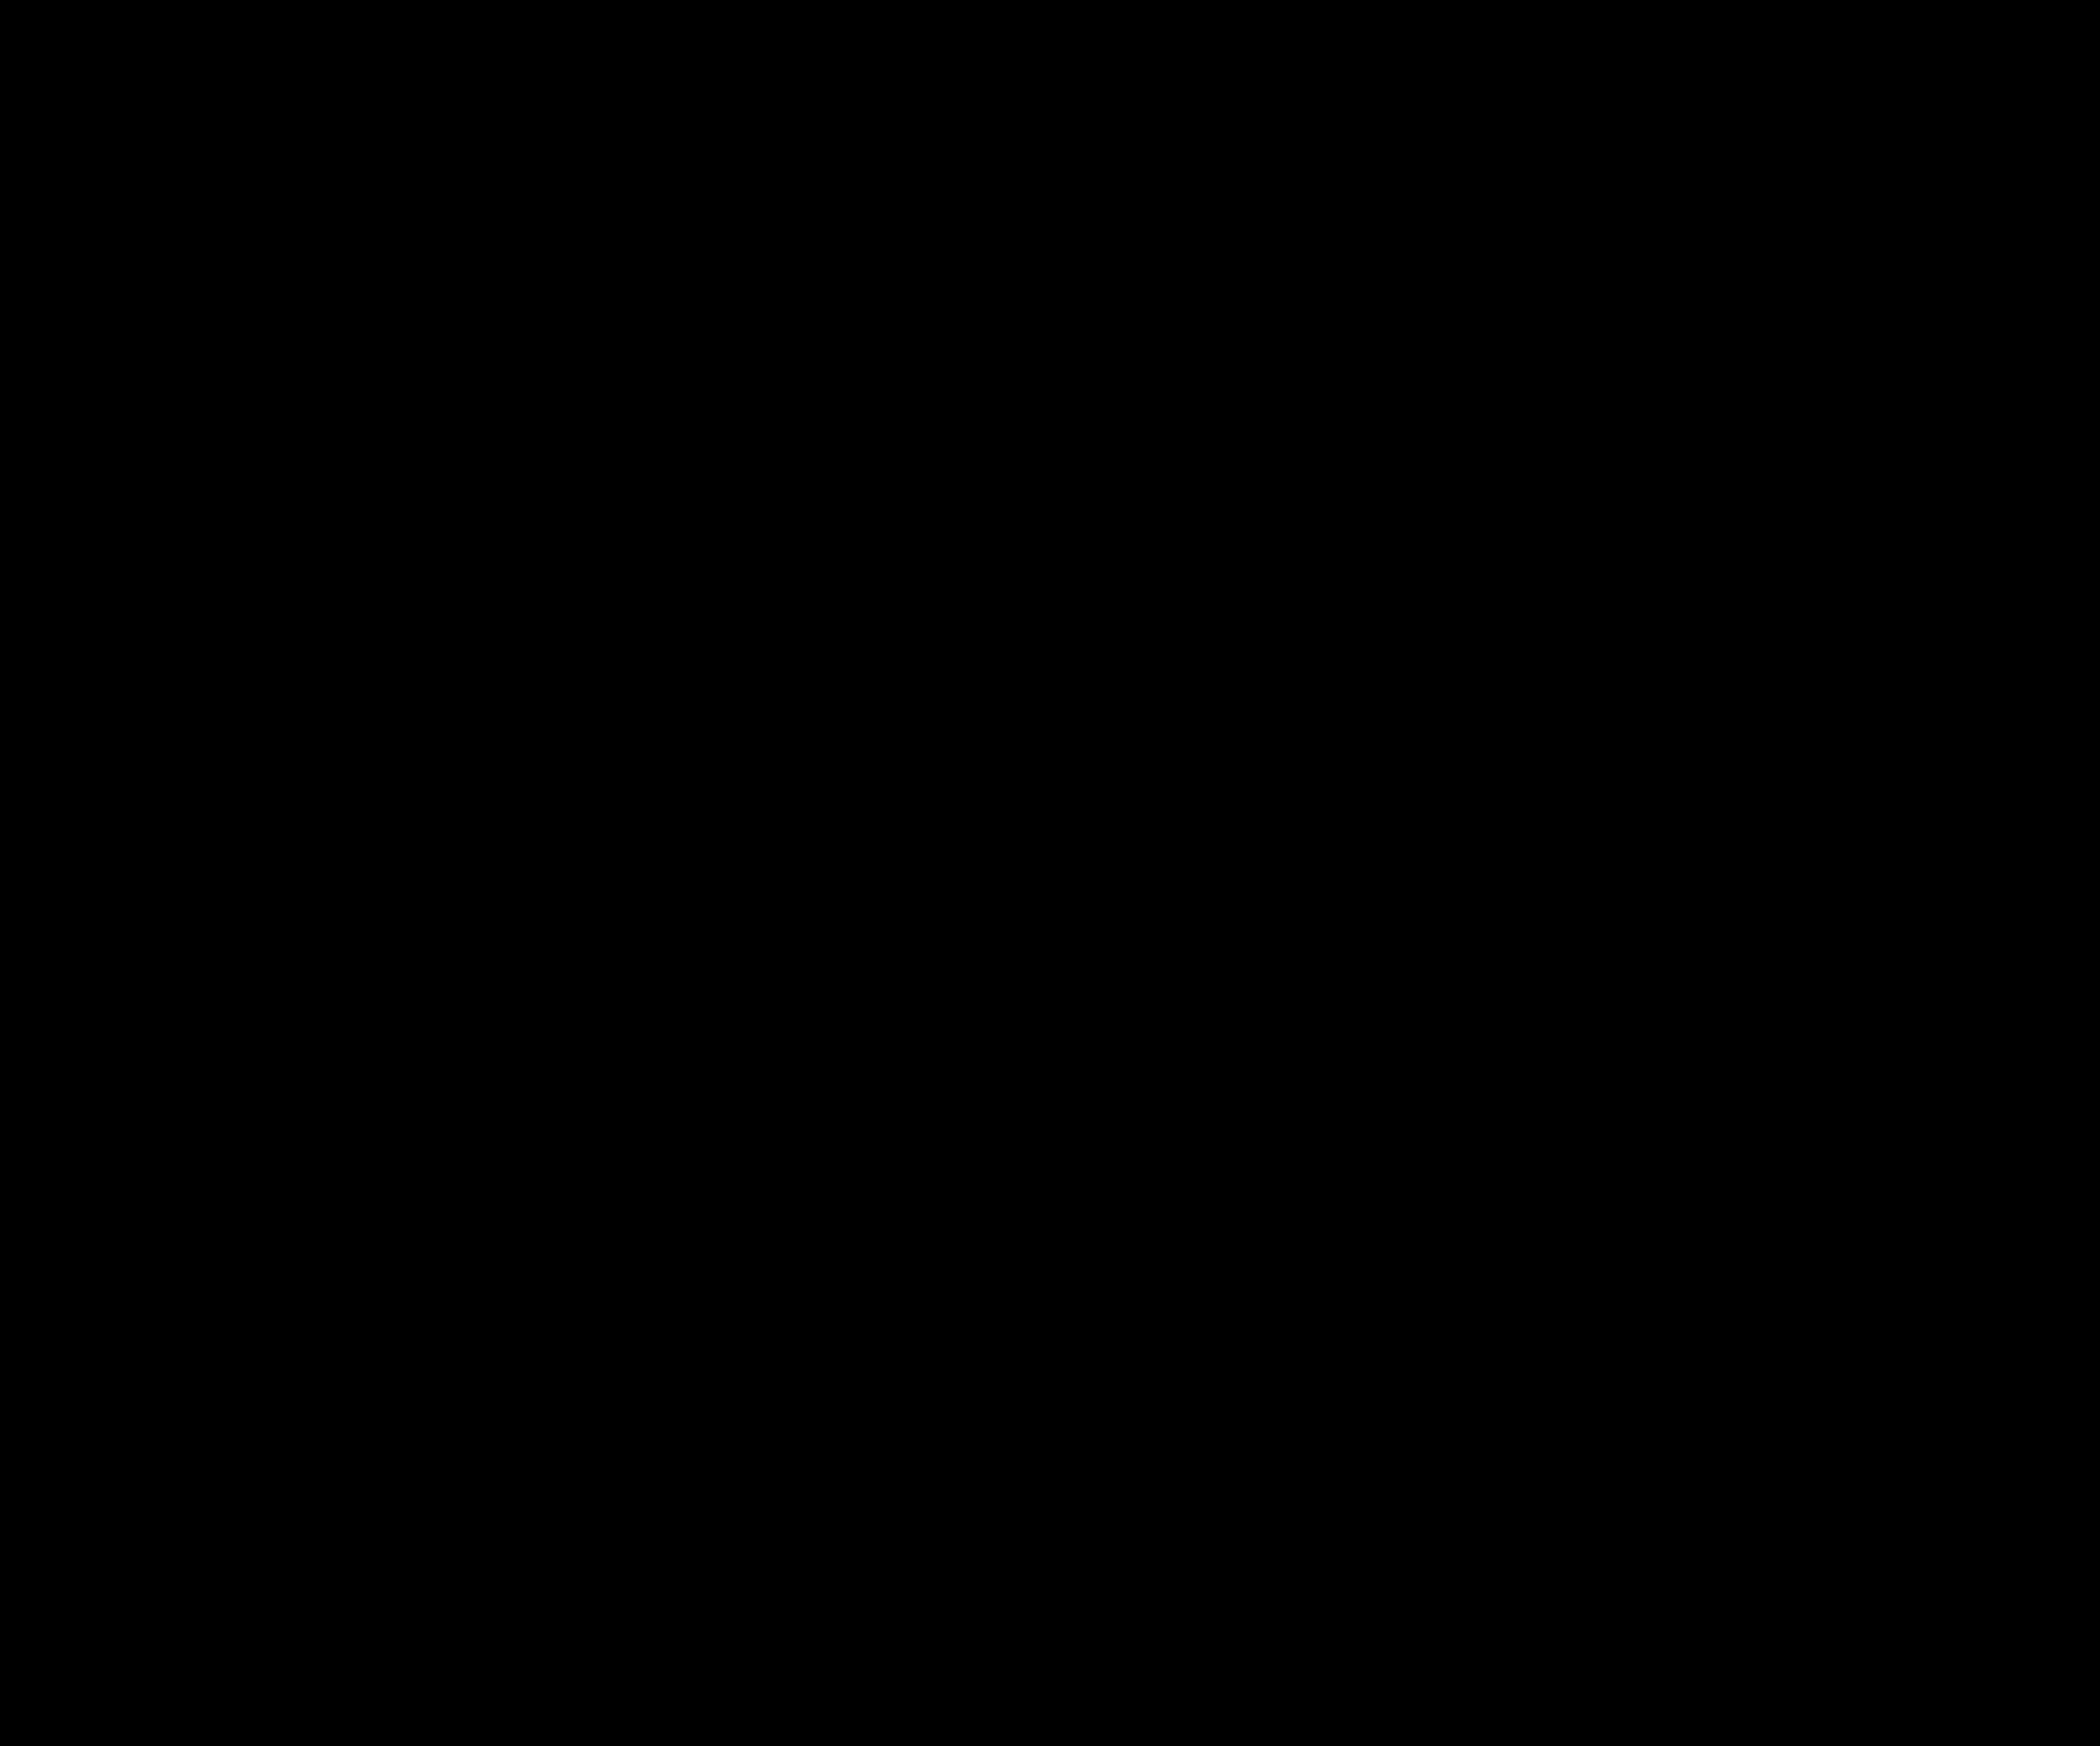 Tiger stripe pumpkin clipart banner free stock Black and White Train | Steam Train Engine clip art - vector clip ... banner free stock